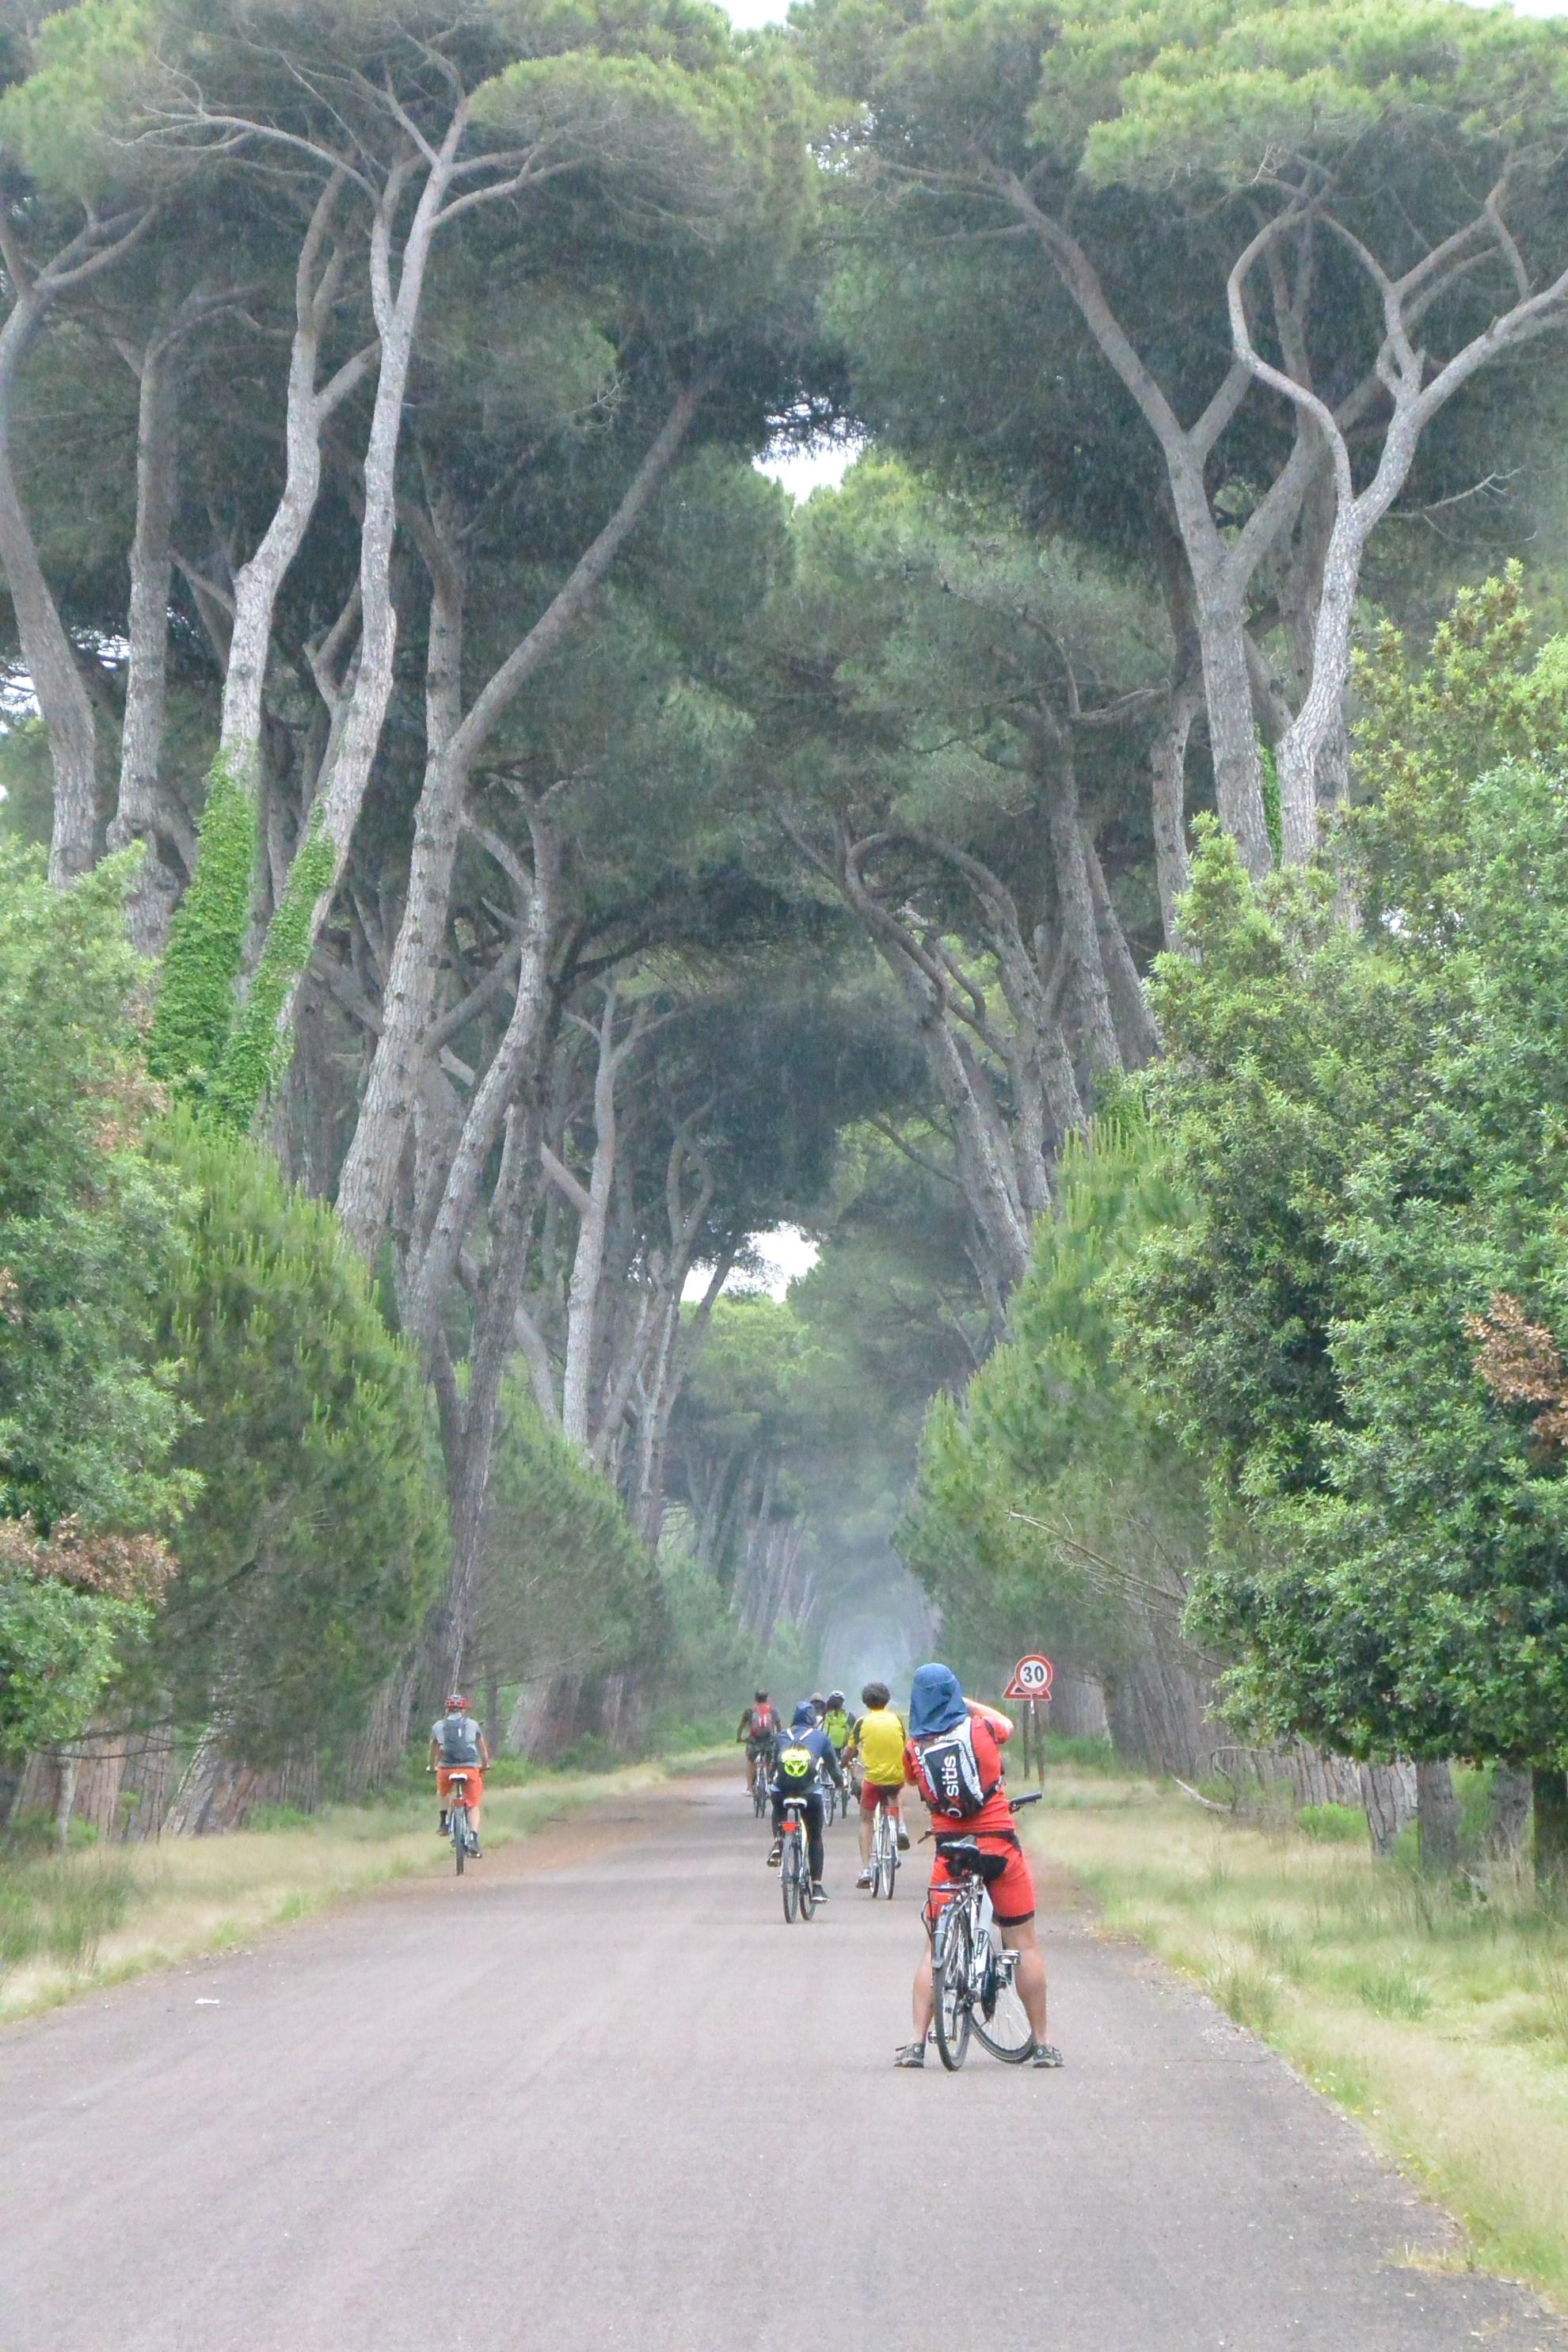 Migliarino San Rossore Massaciuccoli Nemzeti Park Forrás: Soul running